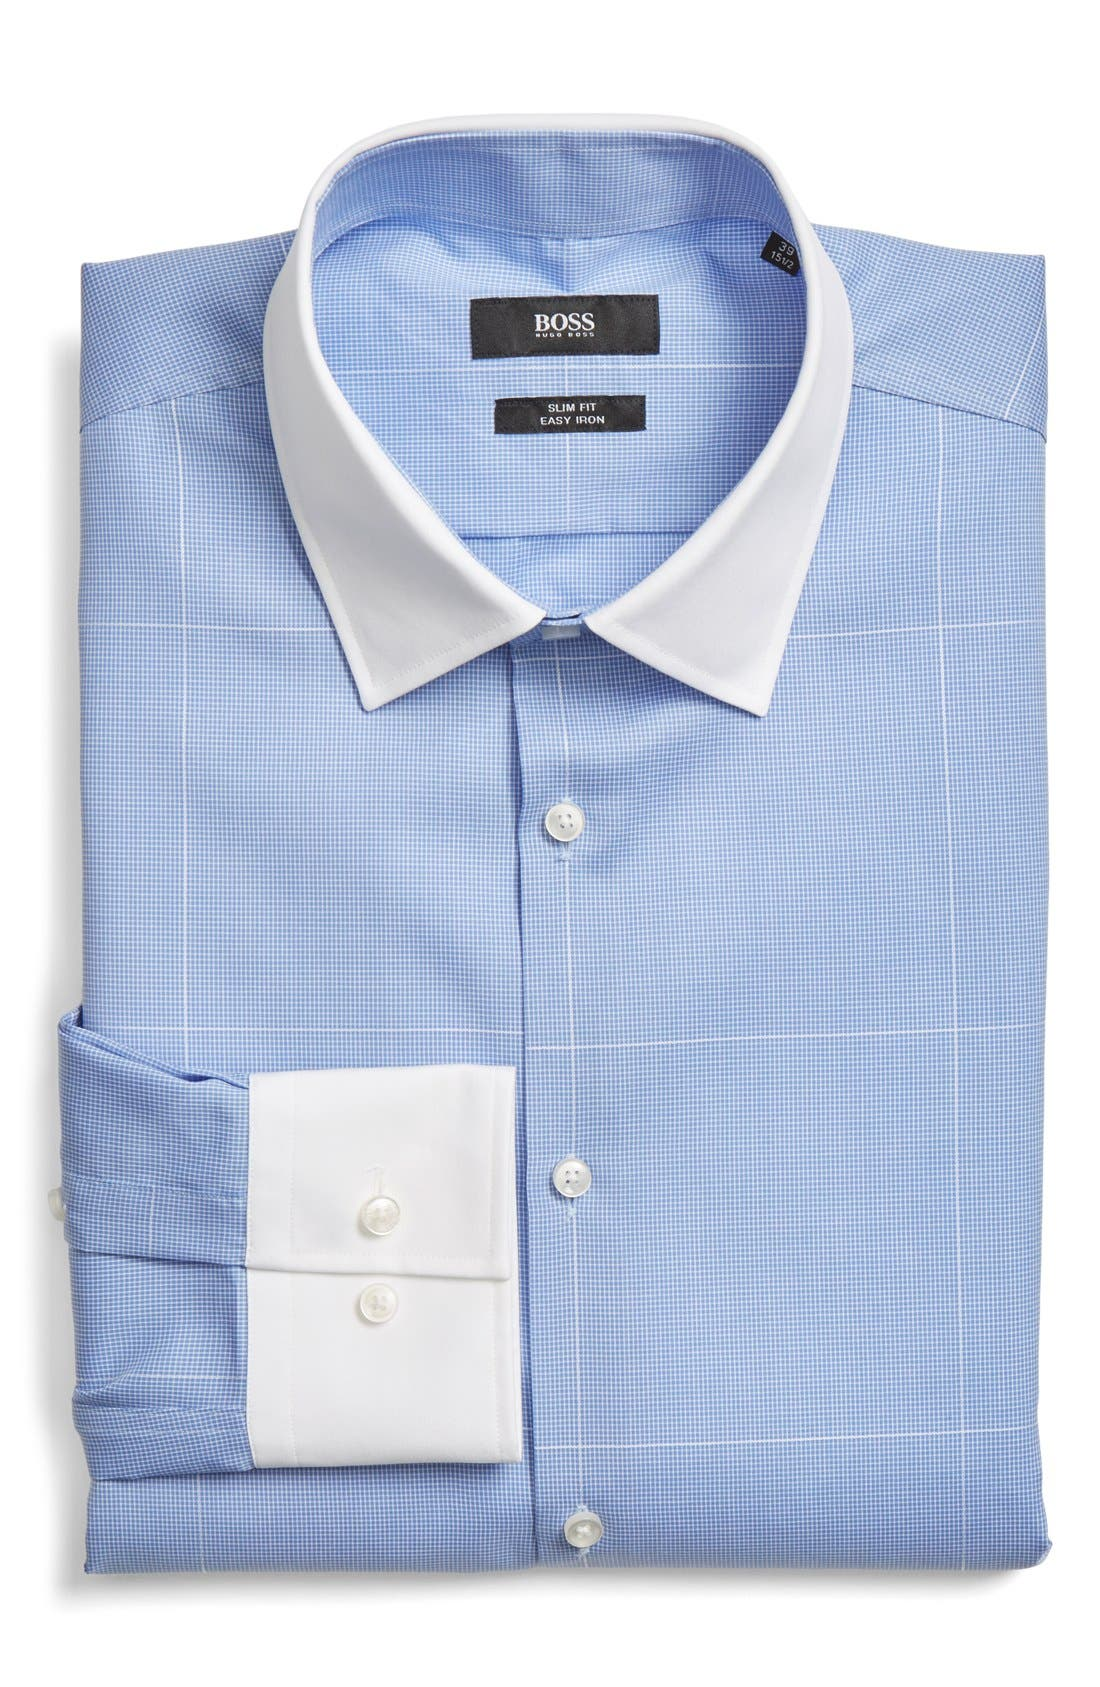 Alternate Image 1 Selected - BOSS WW Slim Fit Easy Iron Check Dress Shirt